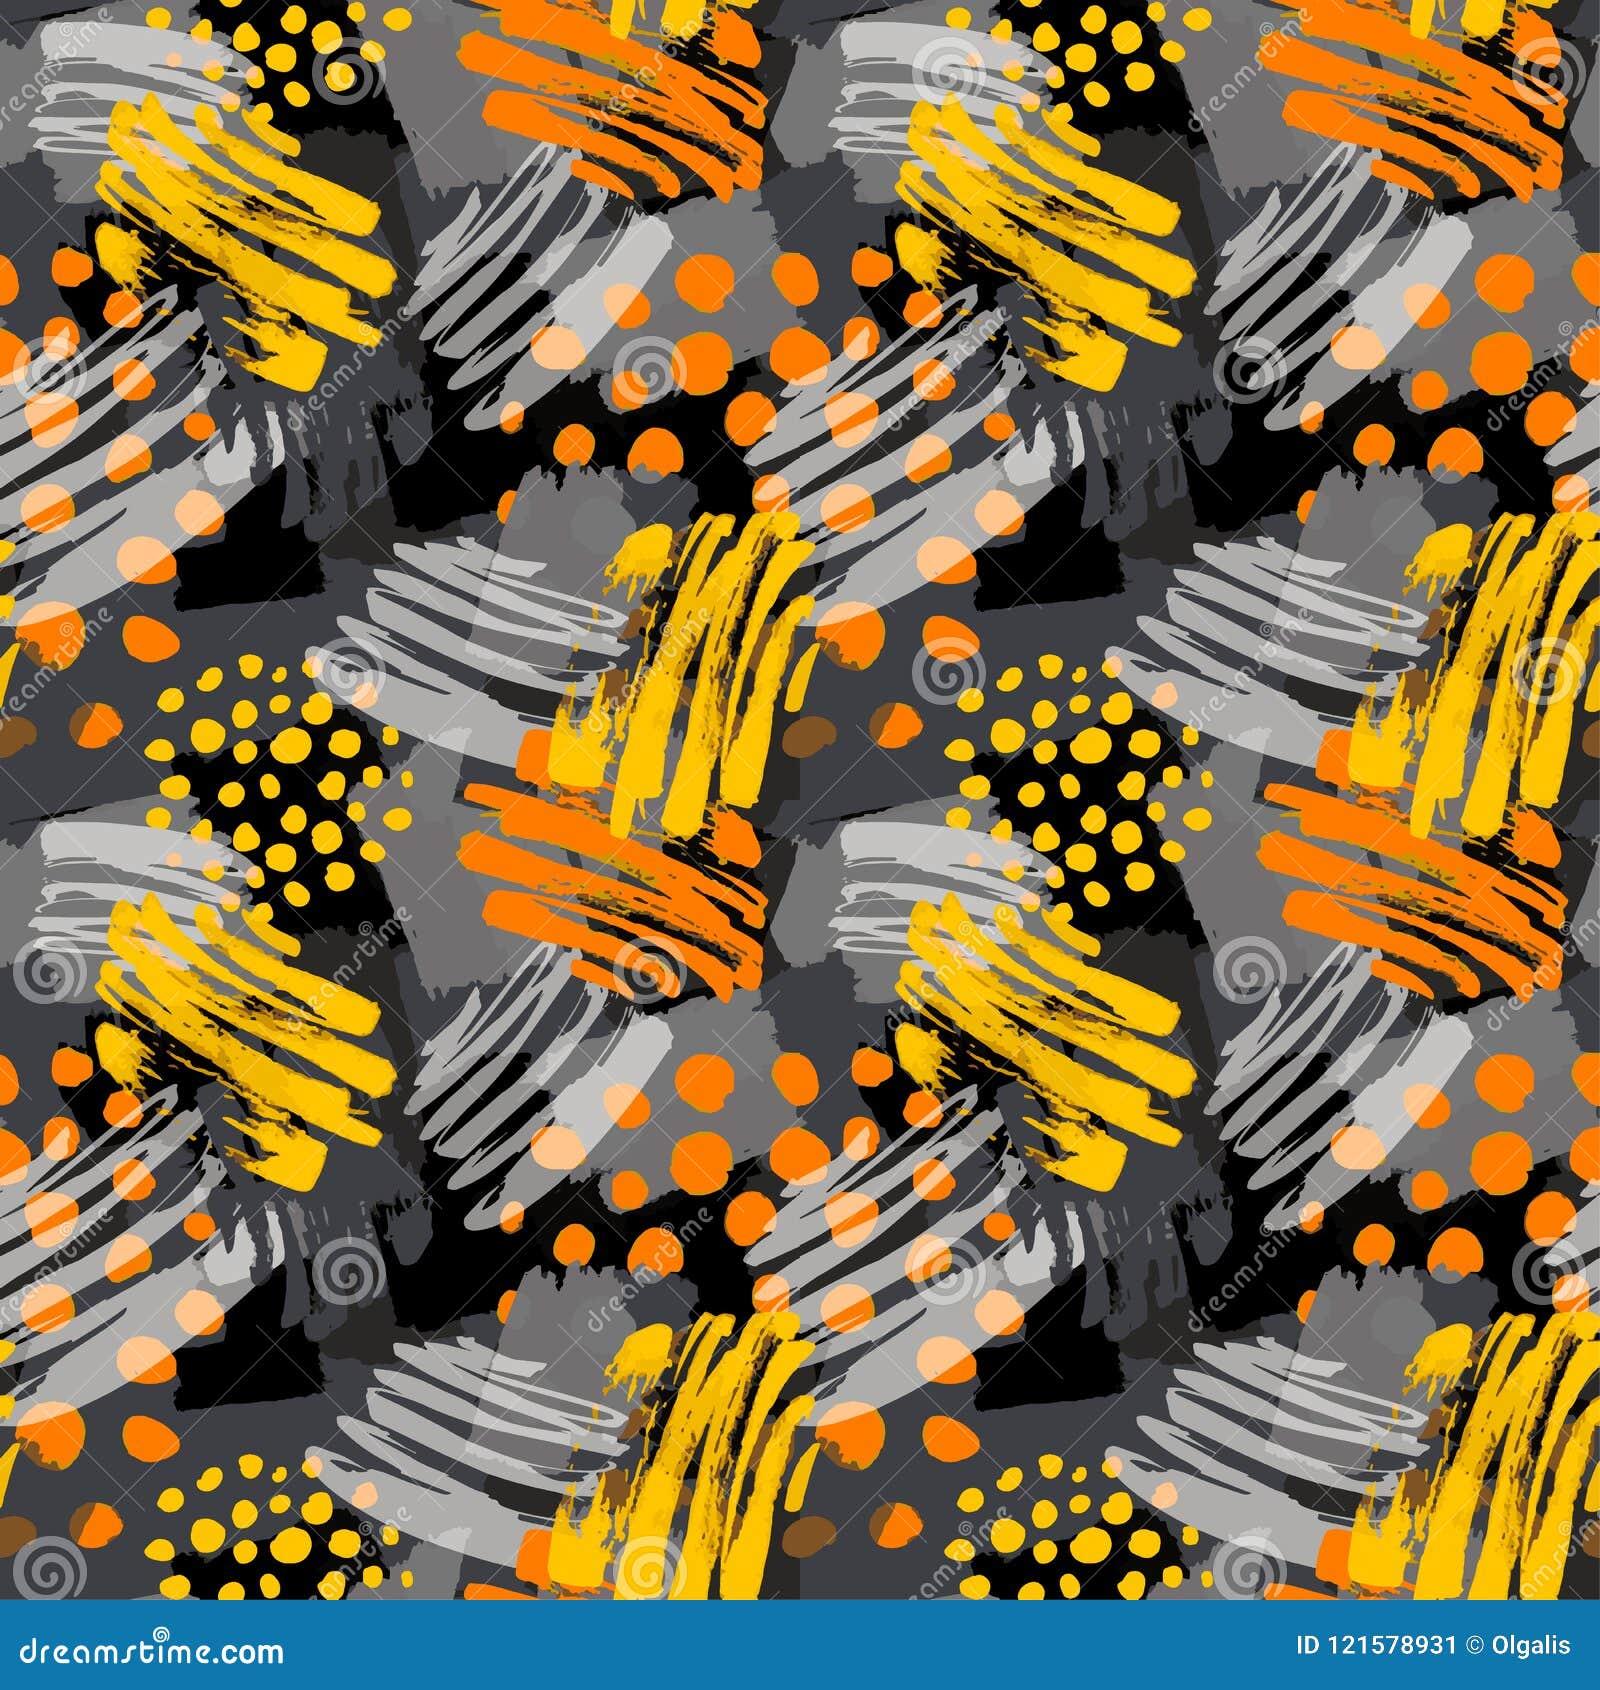 Surface Pattern Design Graffiti Seamless Hand Craft Expressive